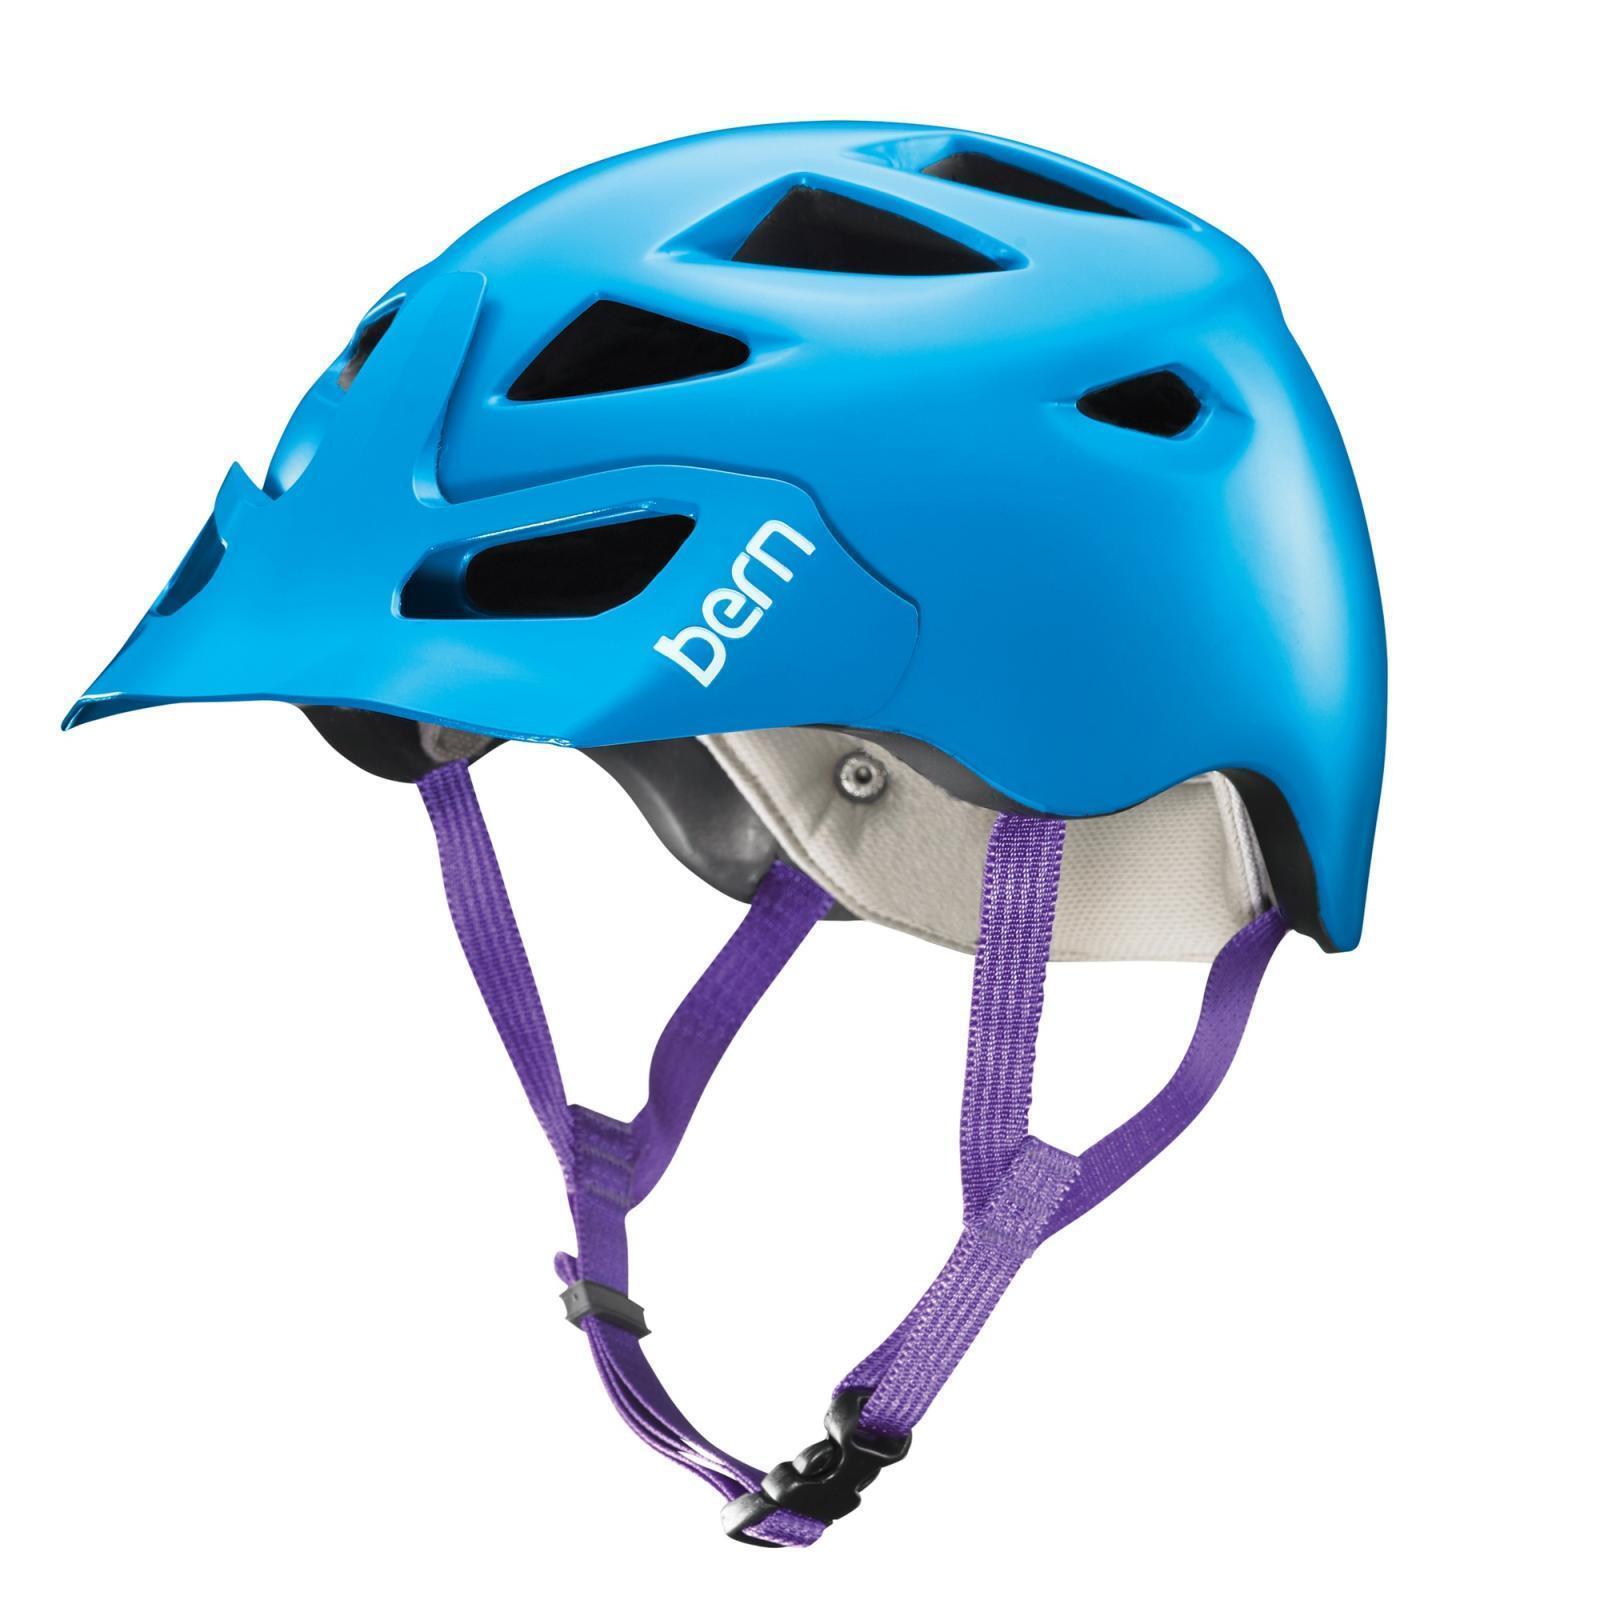 Bern Helm Prescott Zipmold -Visor MTB-Helm, Fahrradhelm 55,5-58cm, 55,5-58cm, 55,5-58cm, blau a9462f